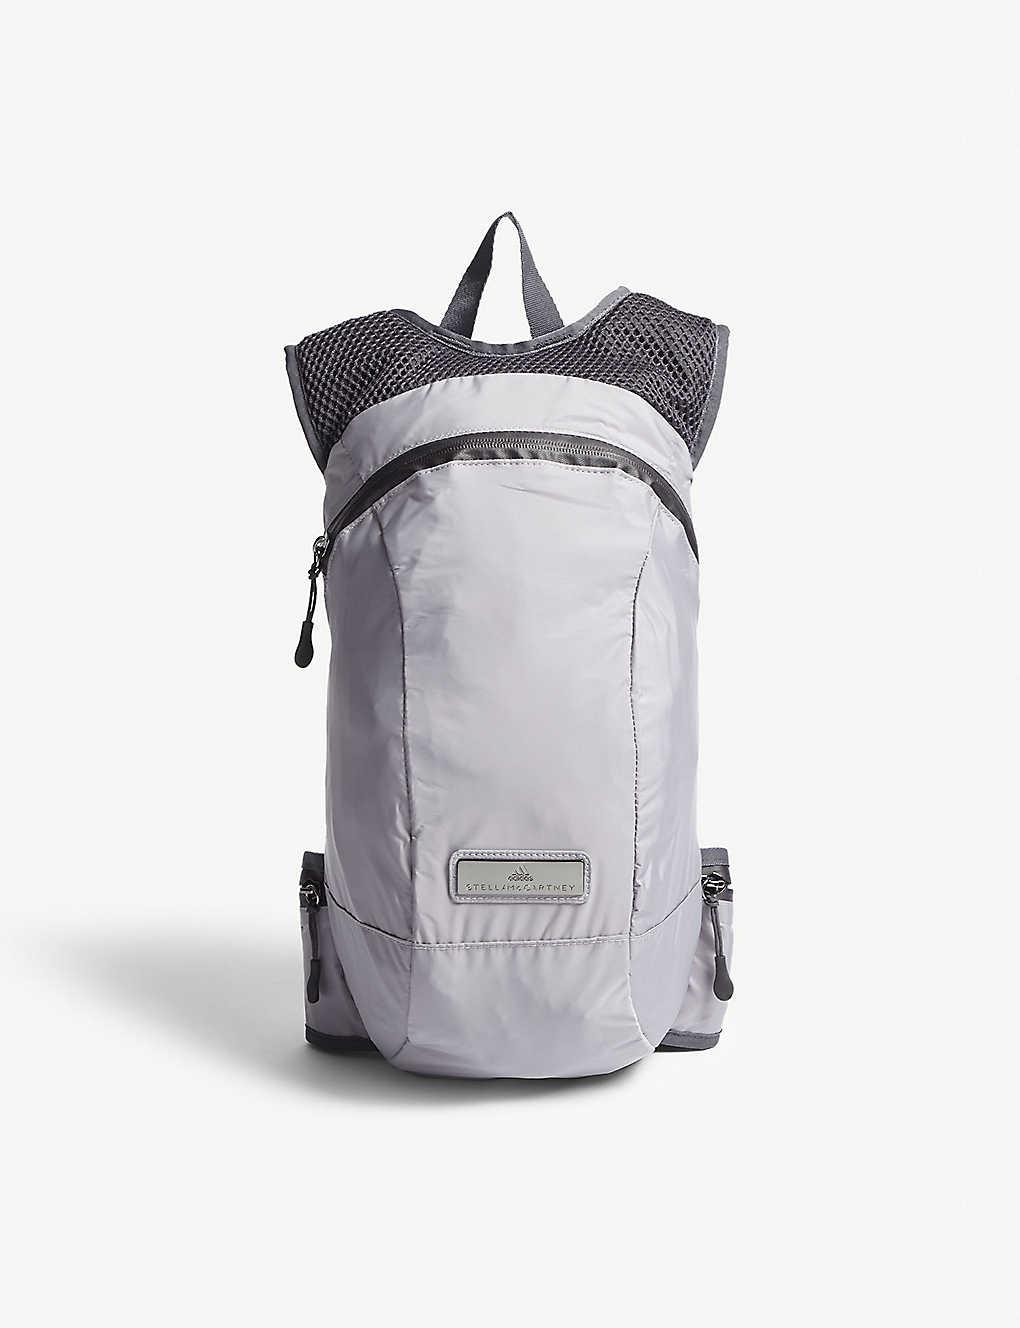 c565bee722 ADIDAS BY STELLA MCCARTNEY - Adizero nylon running backpack ...